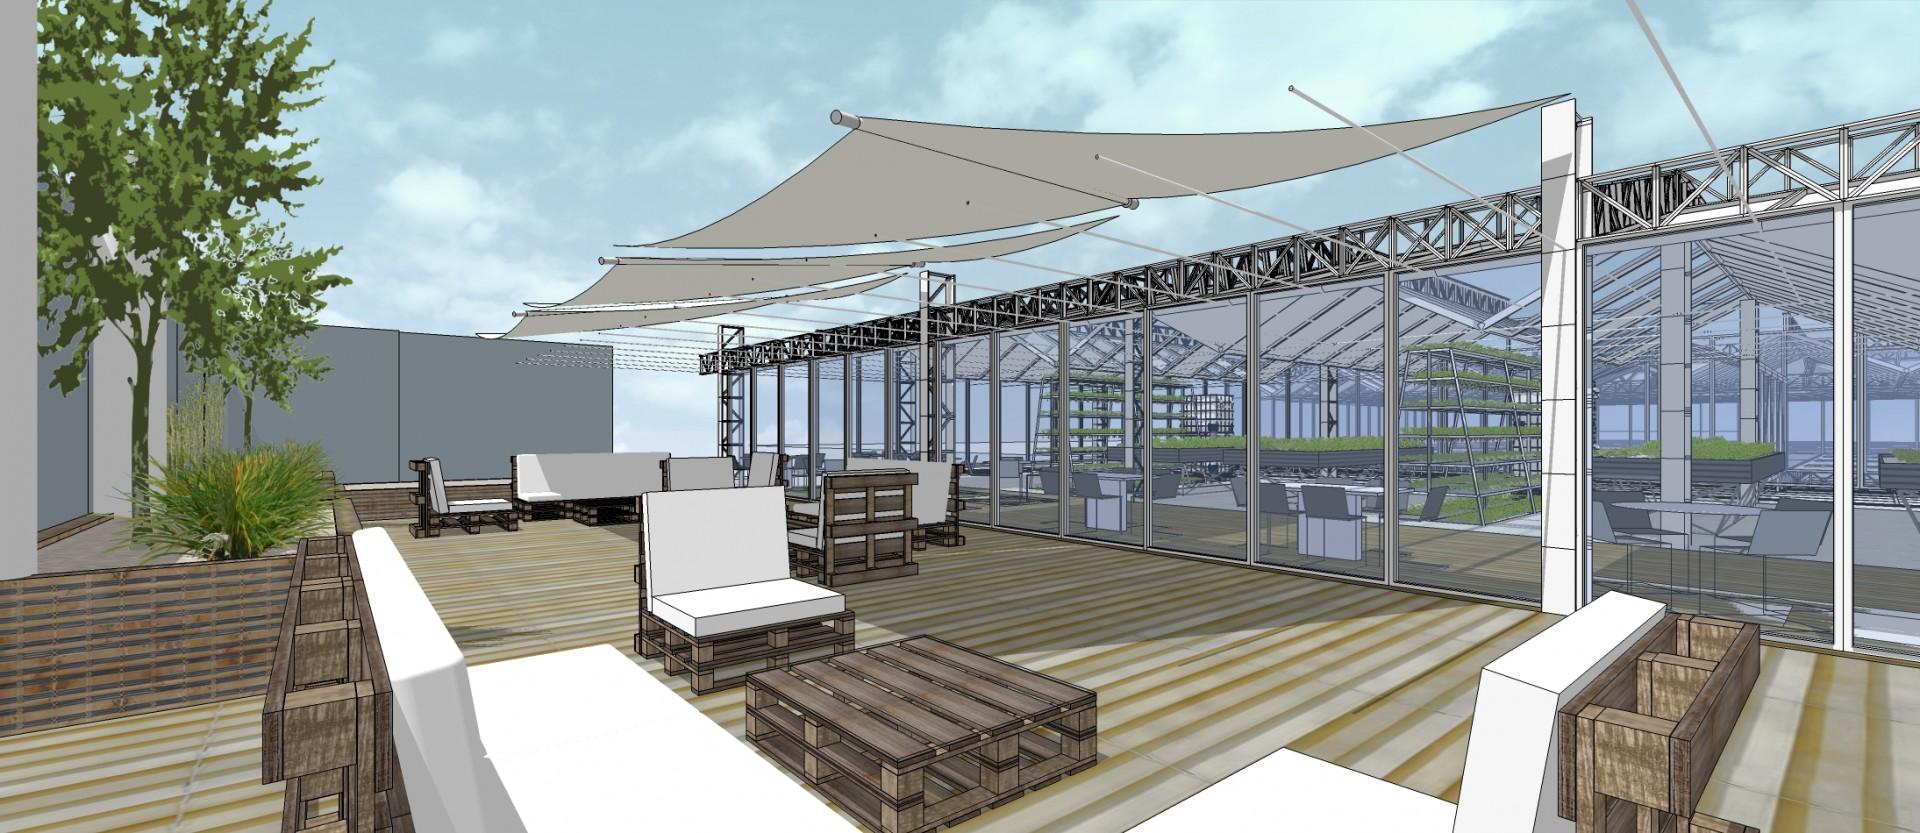 green-house rooftop restaurant 03 terrace